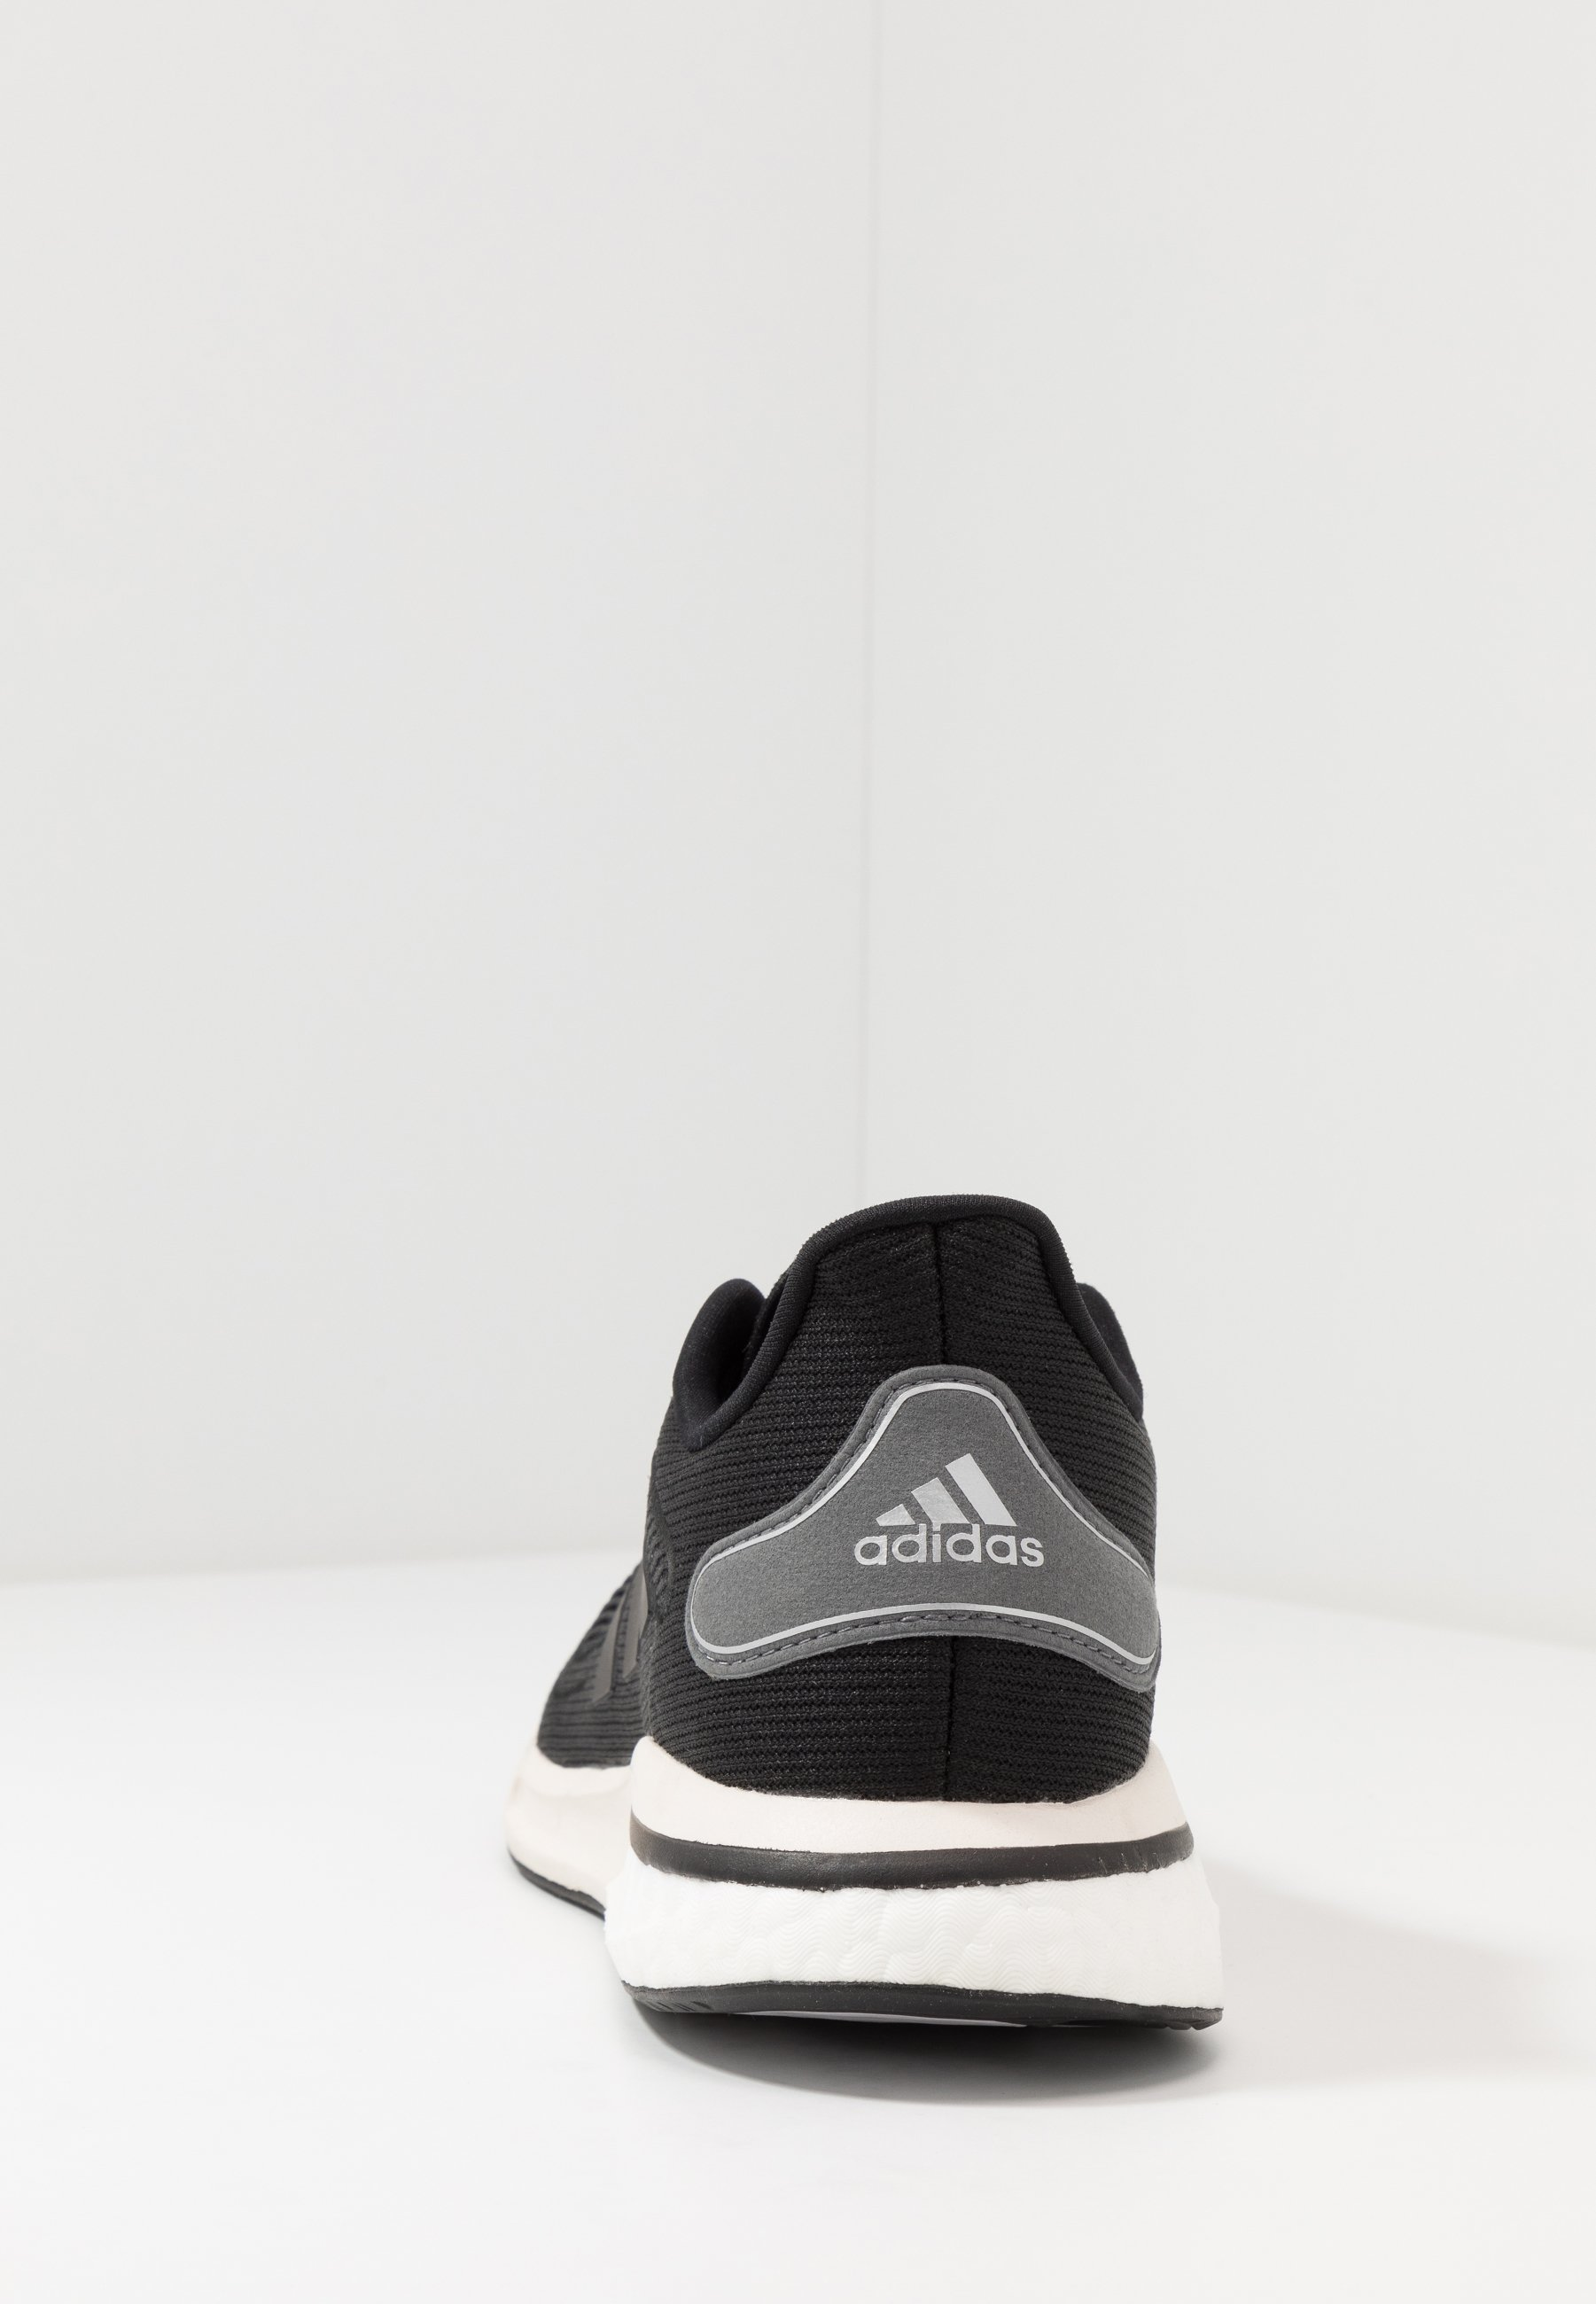 Adidas Performance Supernova - Chaussures De Running Neutres Core Black/grey Six/silver Metallic oLwU7bV